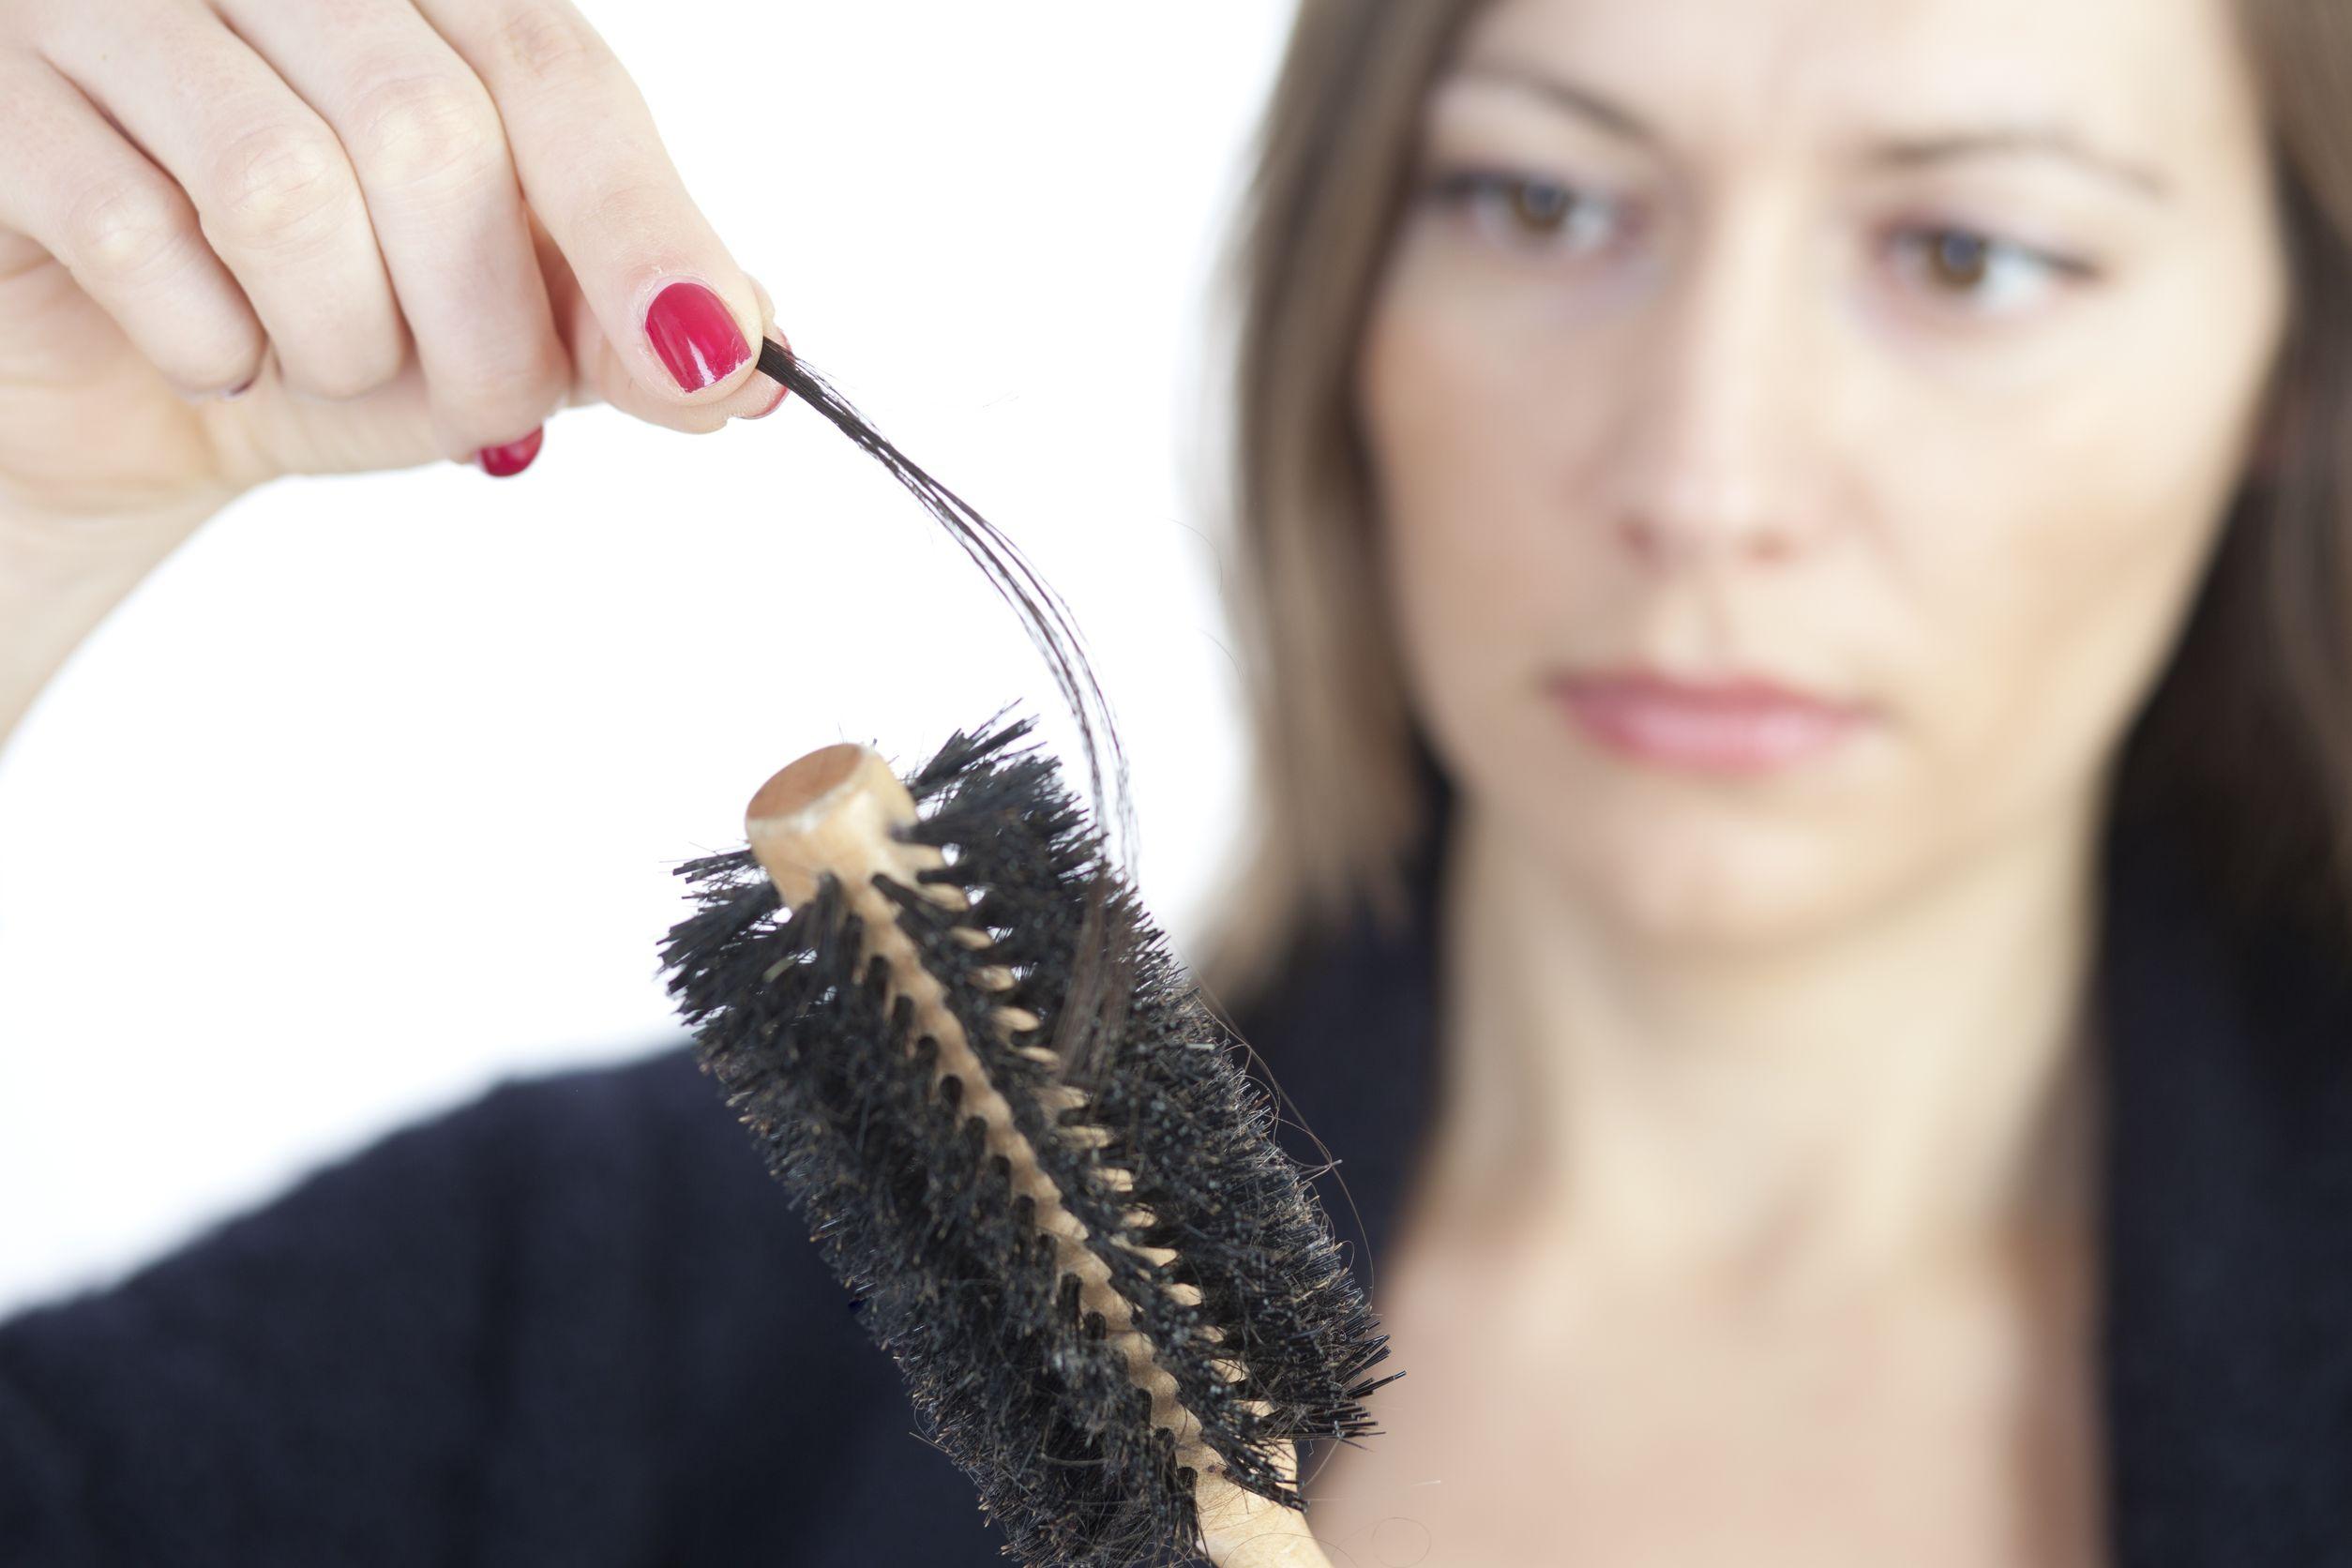 Female hair loss - Comb